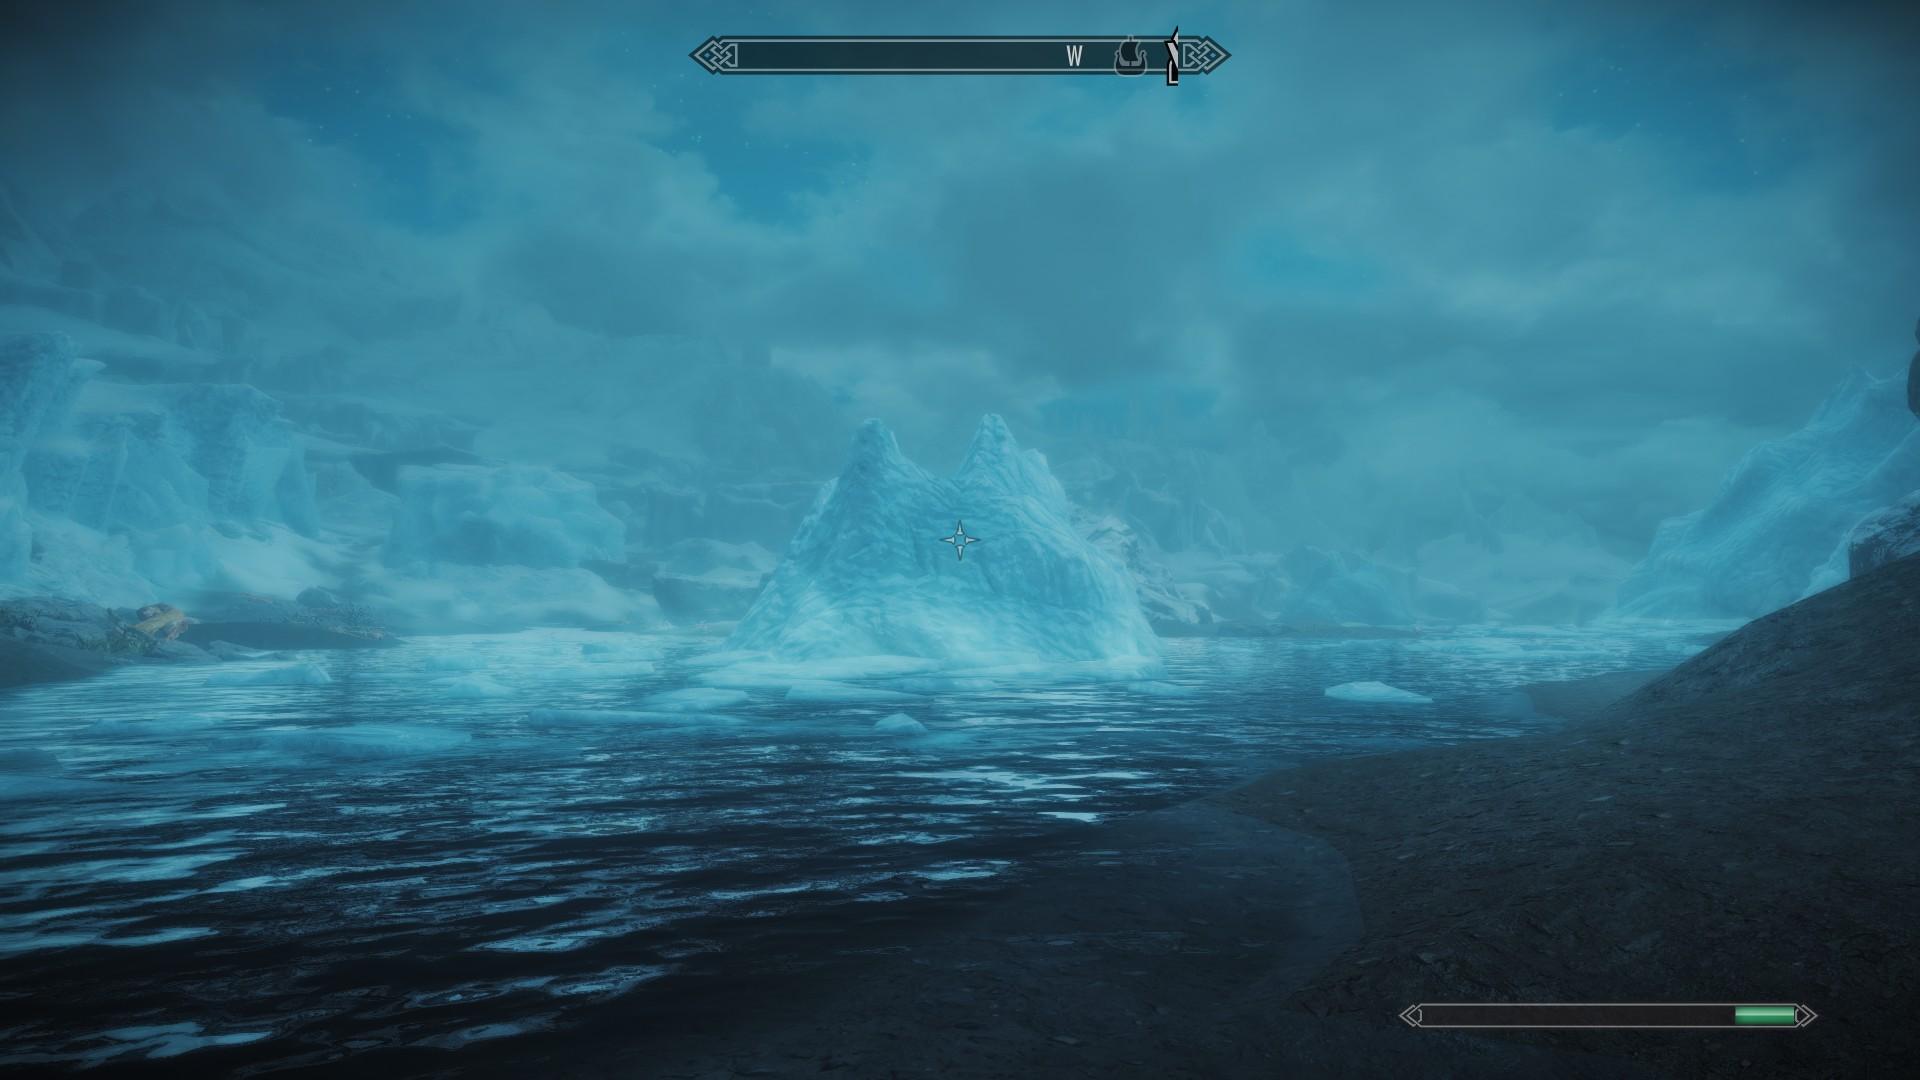 20180210150502_1.jpg - Elder Scrolls 5: Skyrim, the